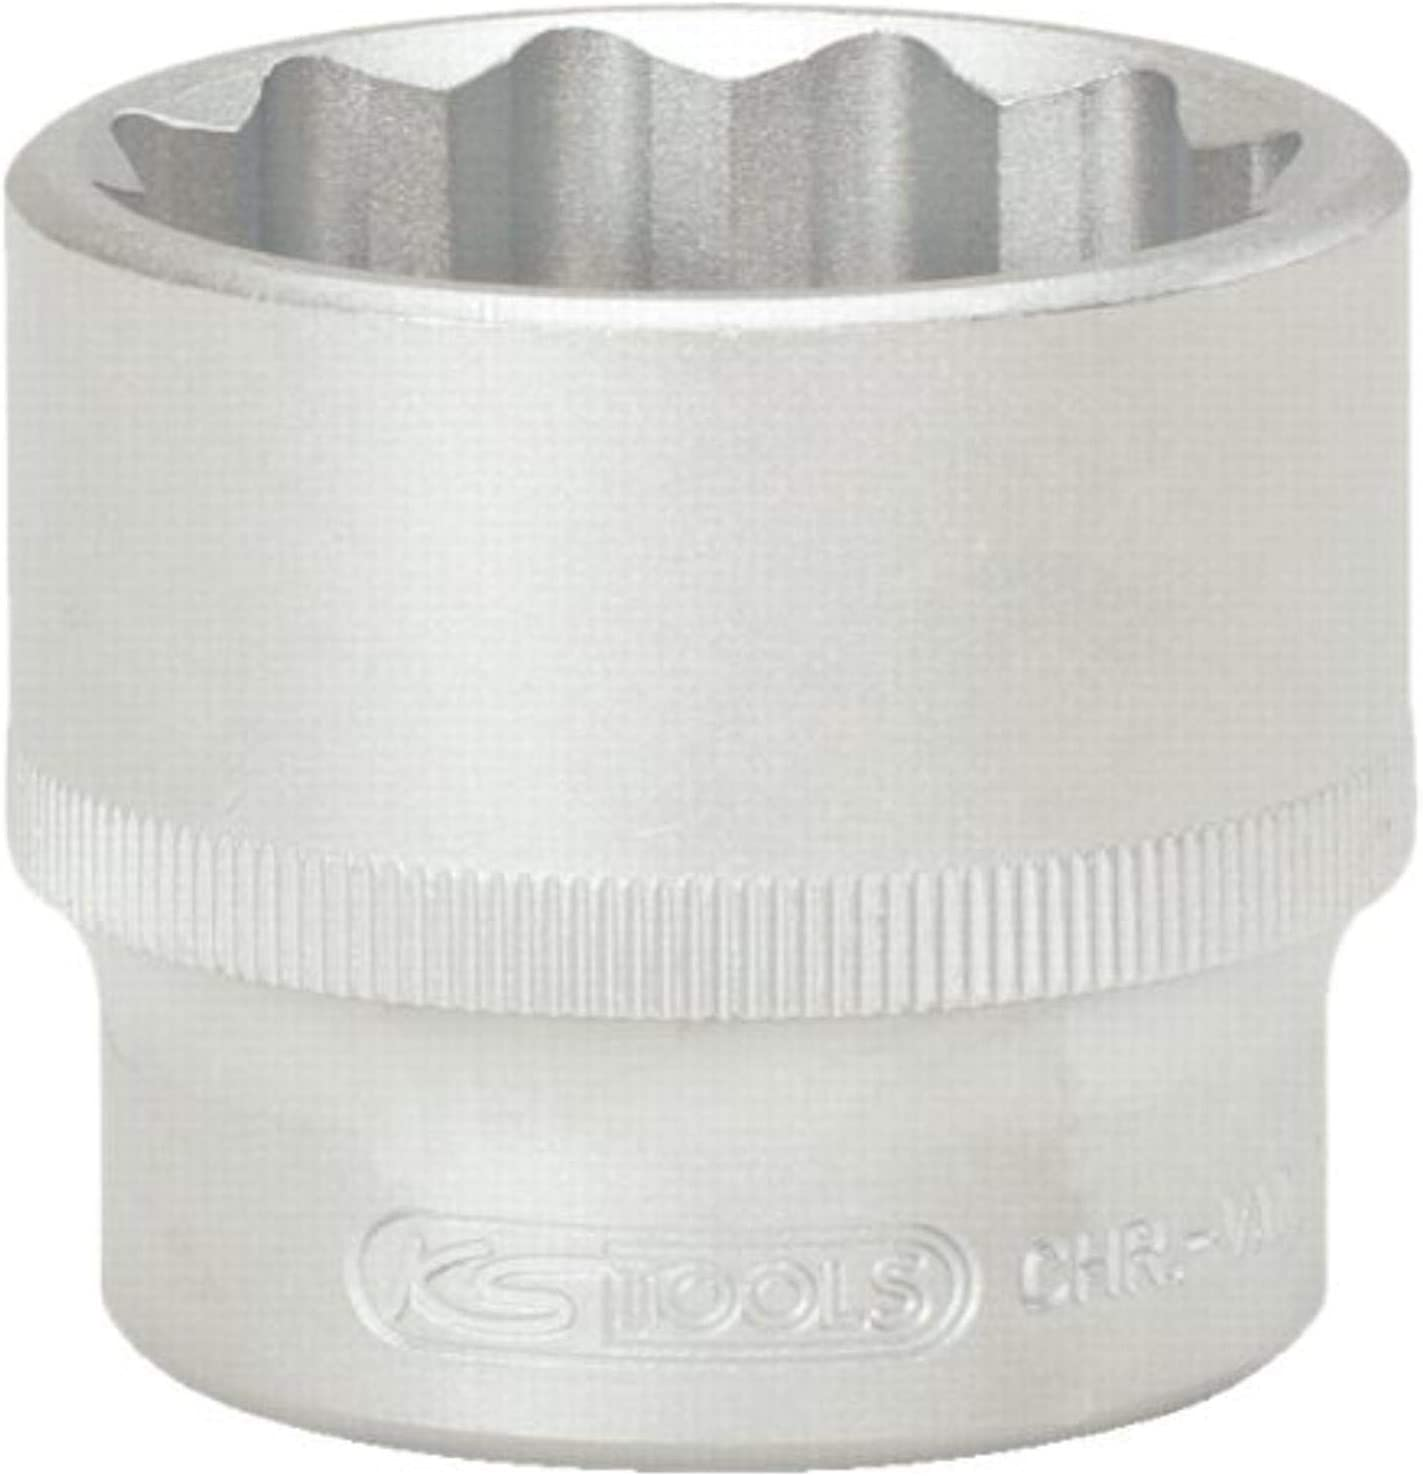 28mm KS Tools 917.1365 Vaso para tornillos 12 cantos tama/ño: 28 mm, 1//2